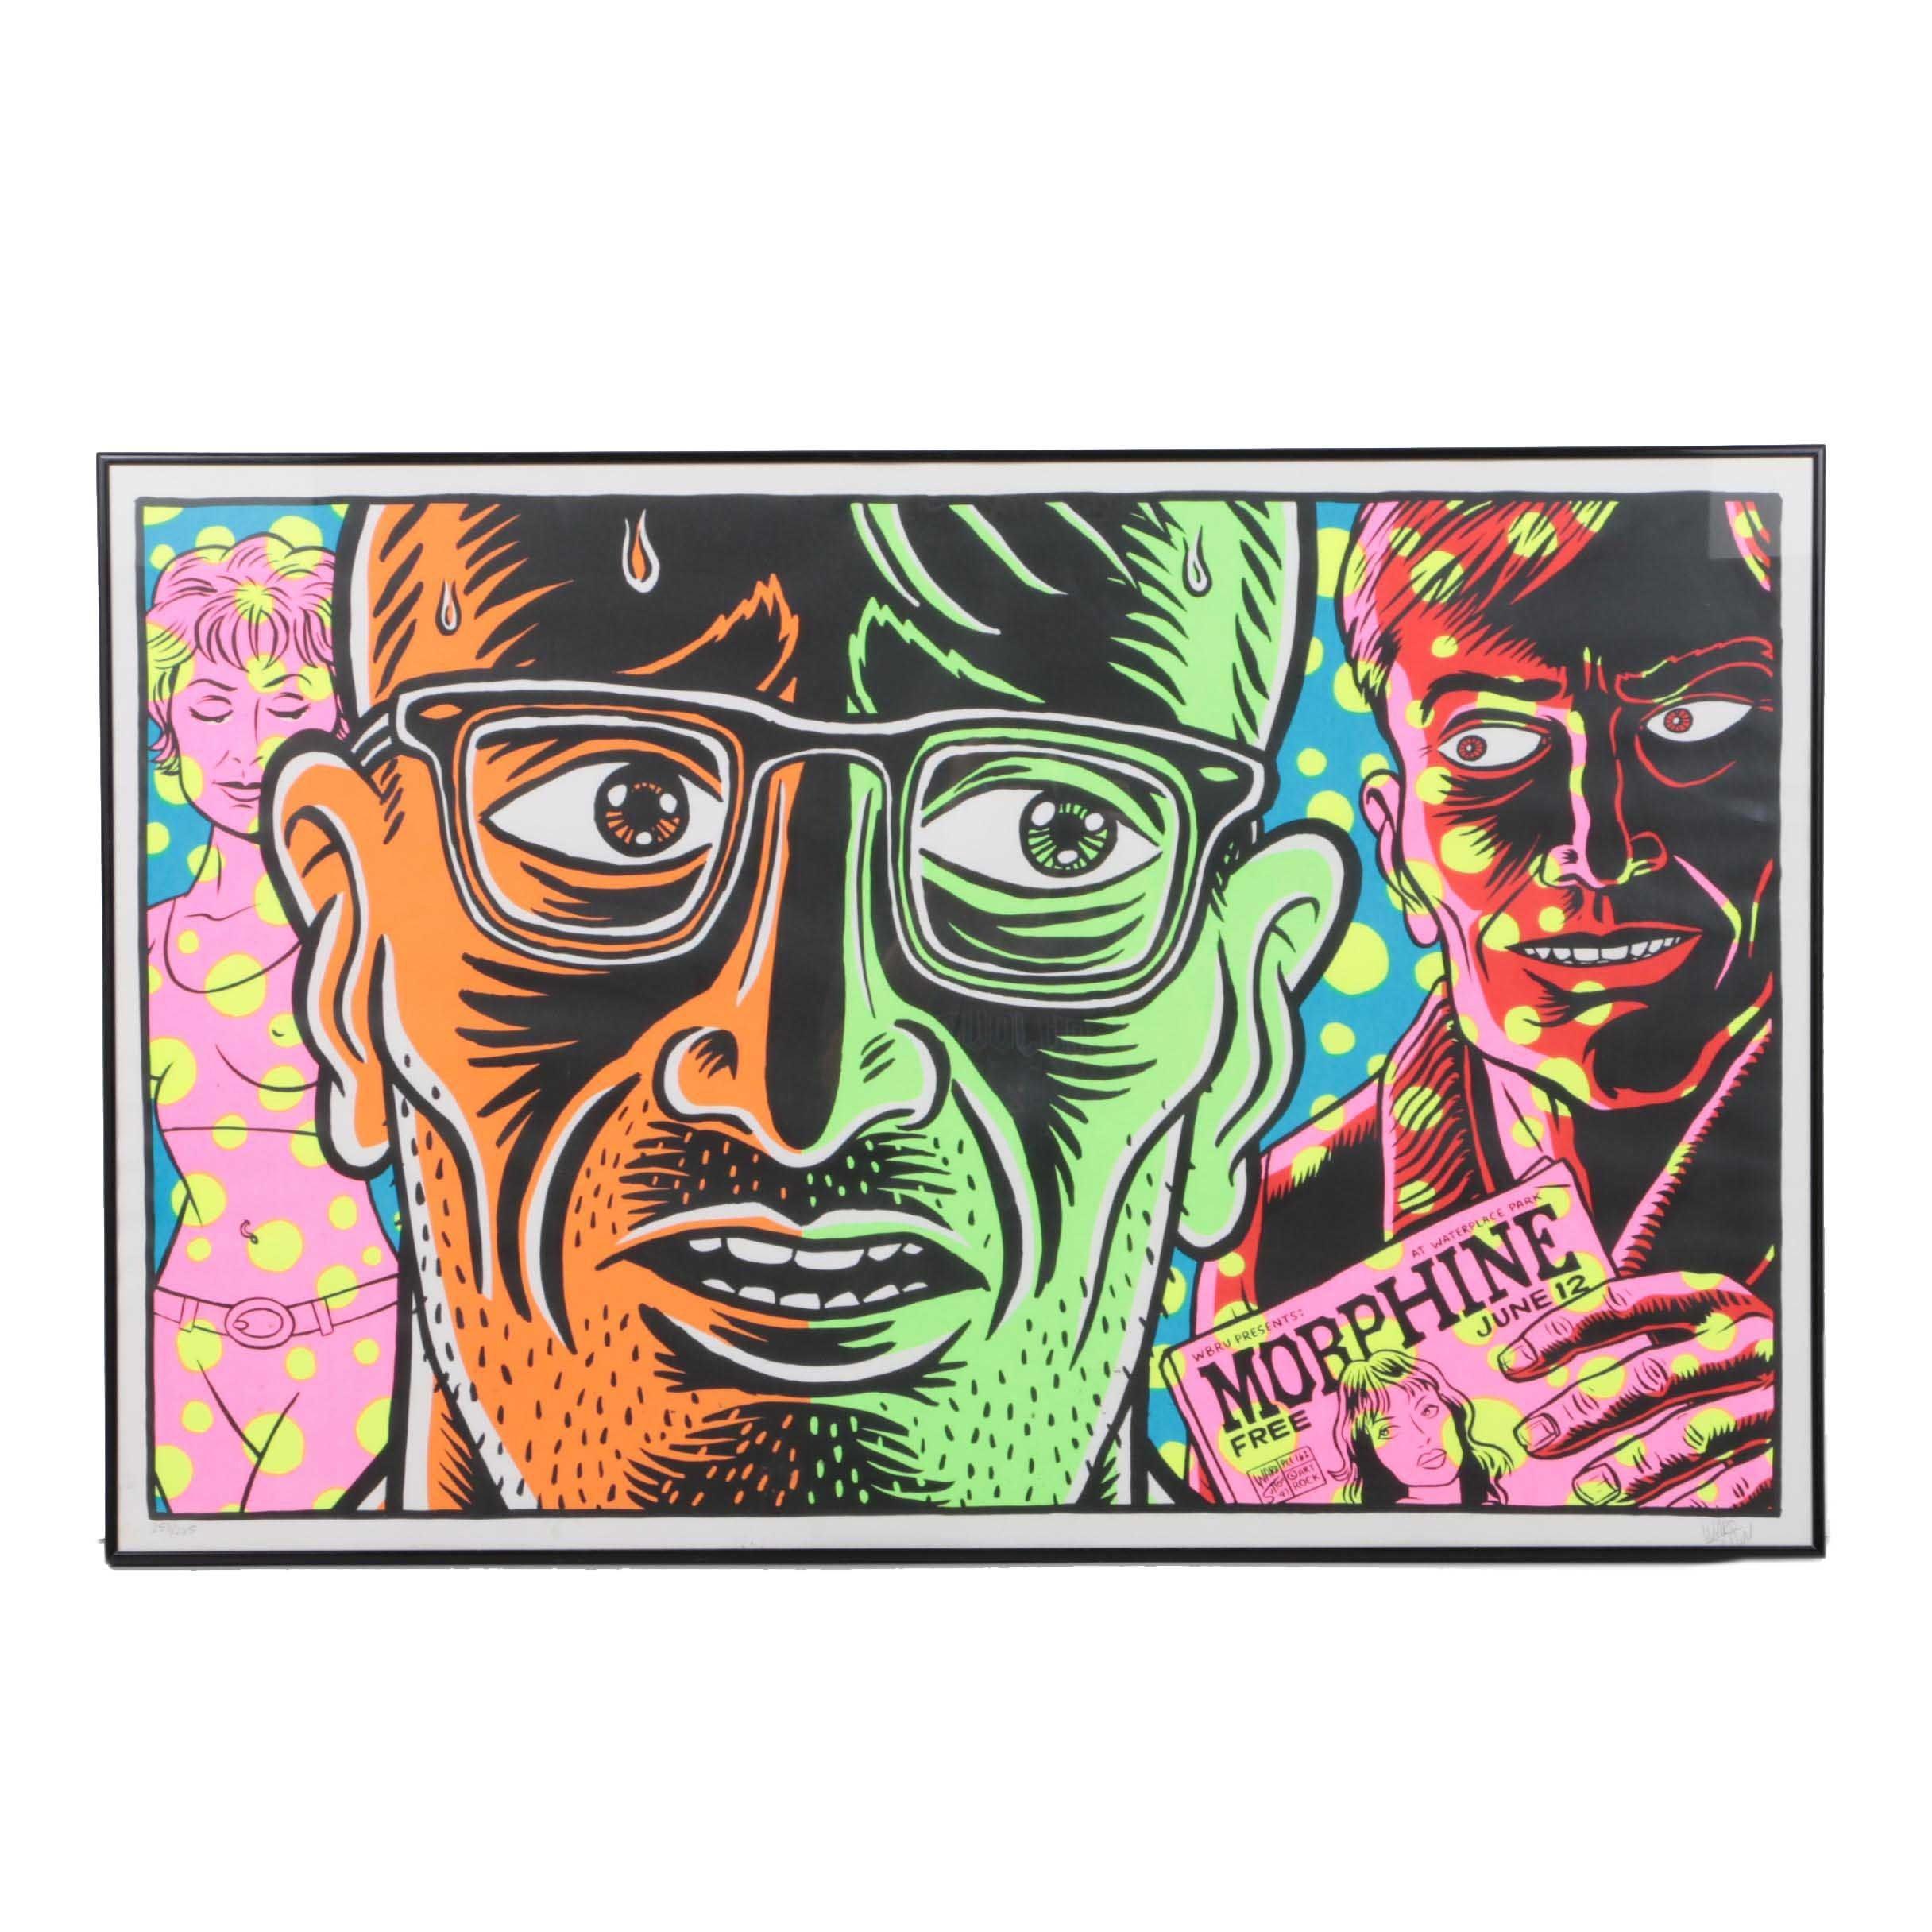 "Ward Sutton Limited Edition Serigraph ""WBRU Presents: Morphine"""